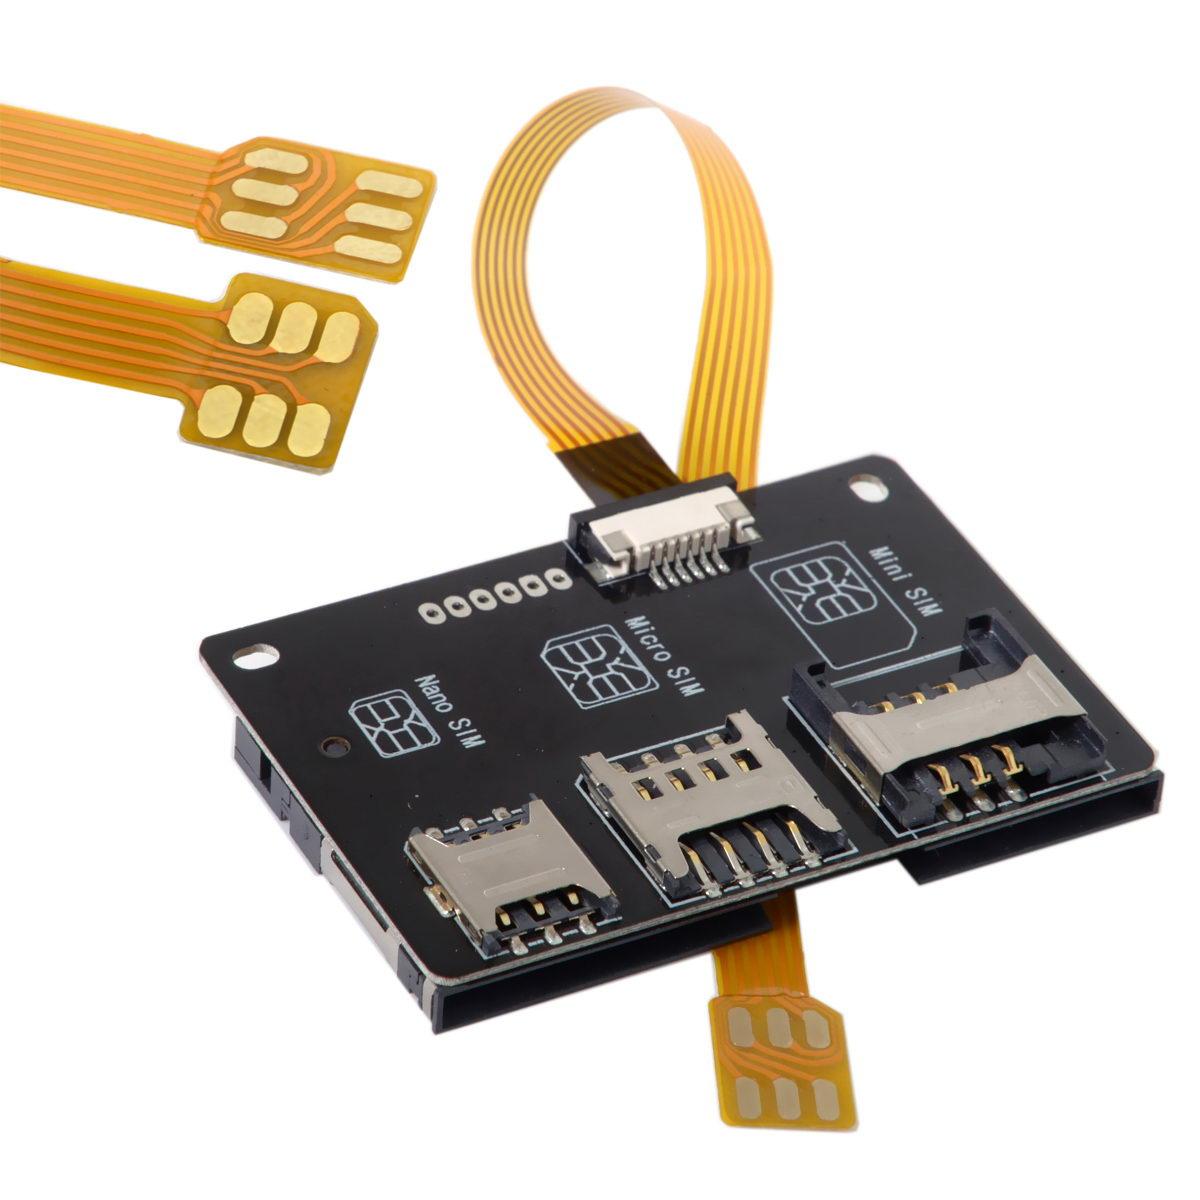 10pcs/lot   Activation Tools Converter Nano SIM to Smartcard IC Card Extension for Micro & Nano SIM Card Adapter Kit